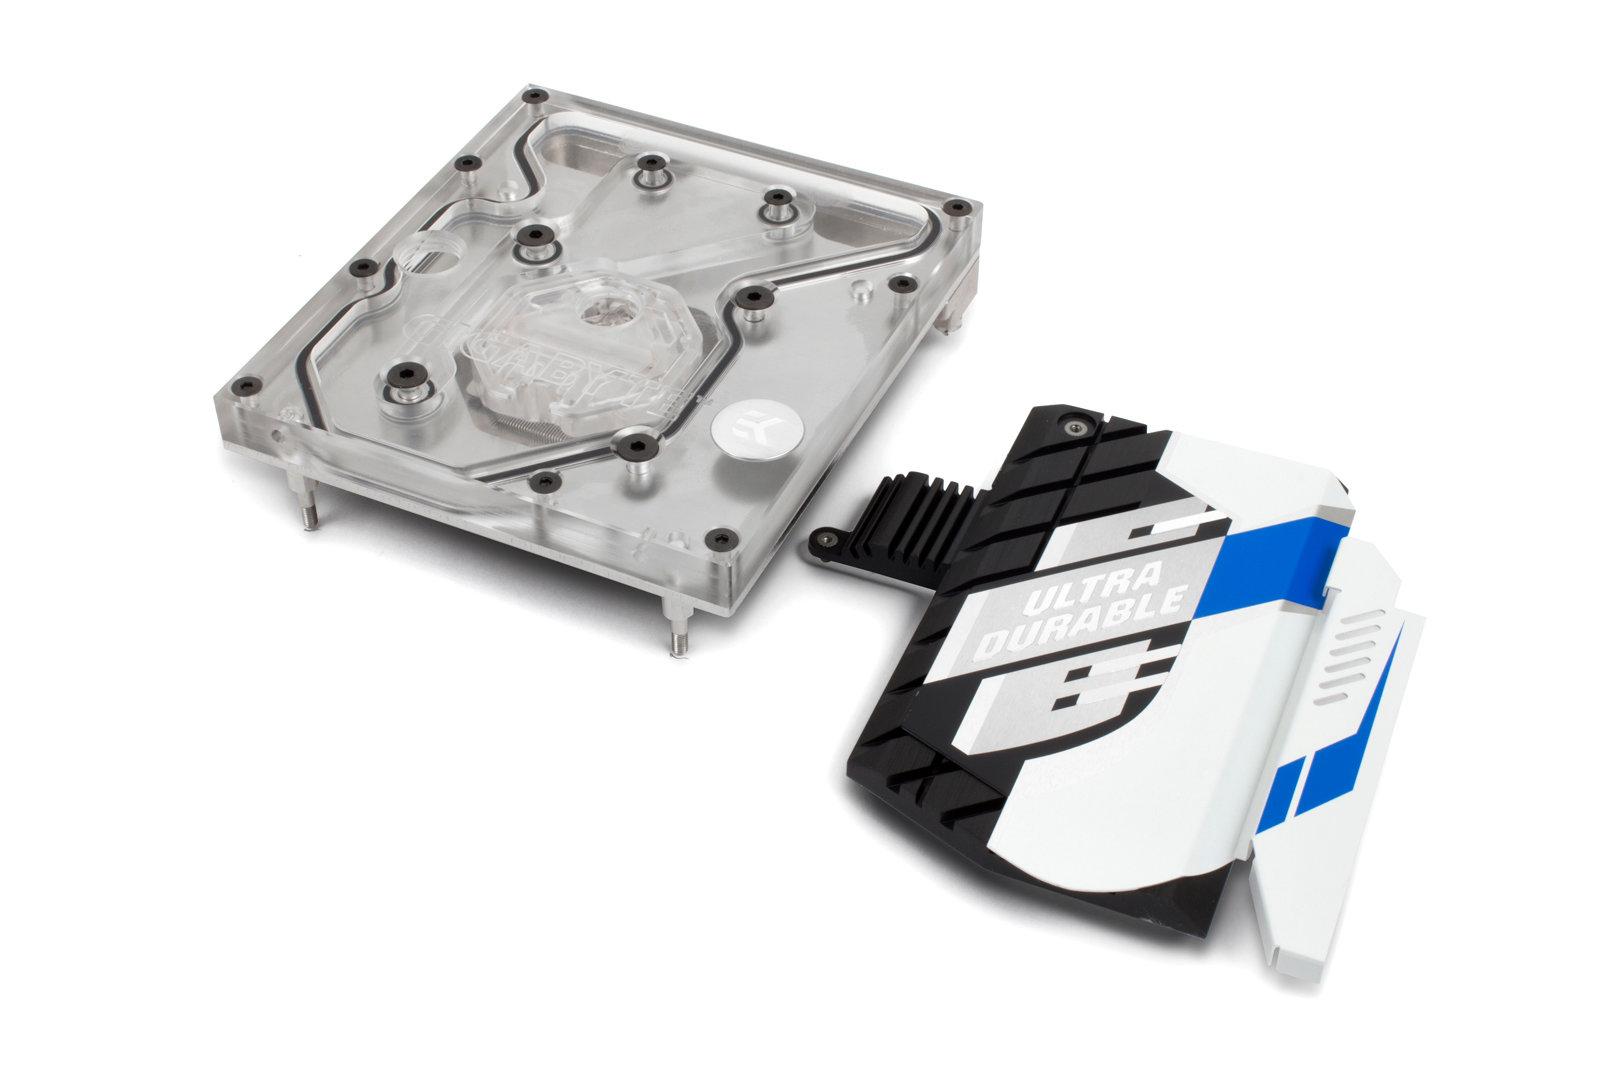 EK-FB GA X99 Designare Monoblock – Nickel mit Chipsatz-Kühler